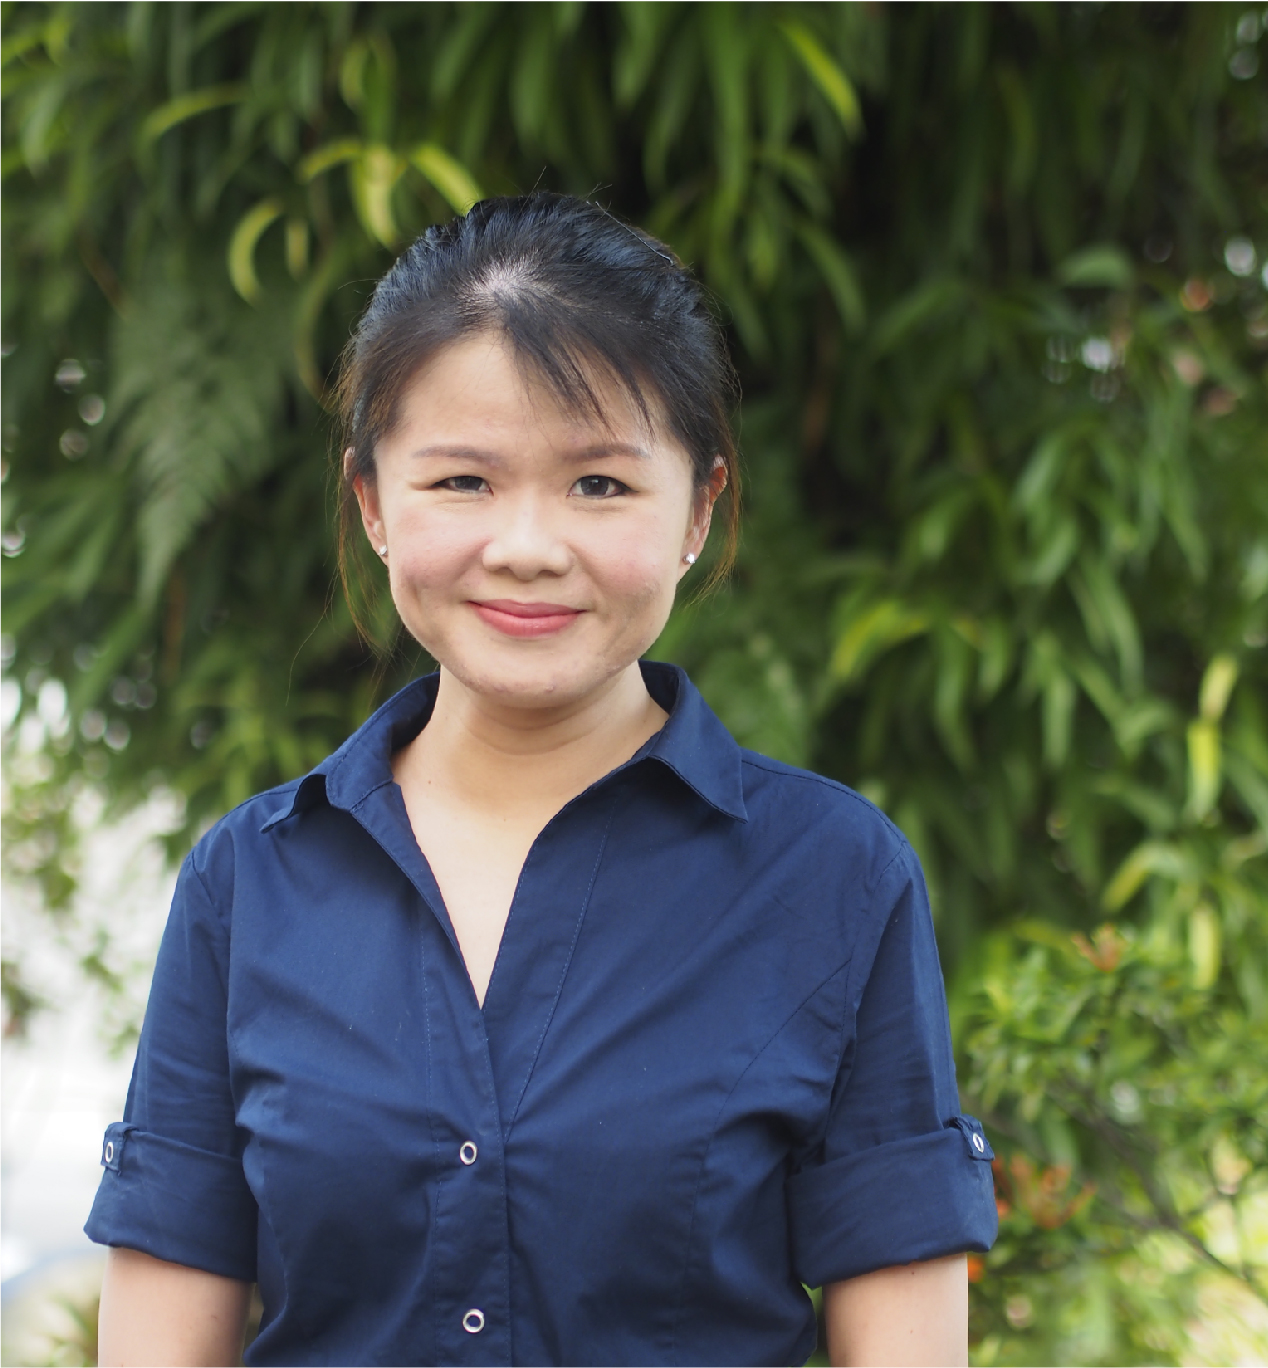 Marie Ng Sze Ying